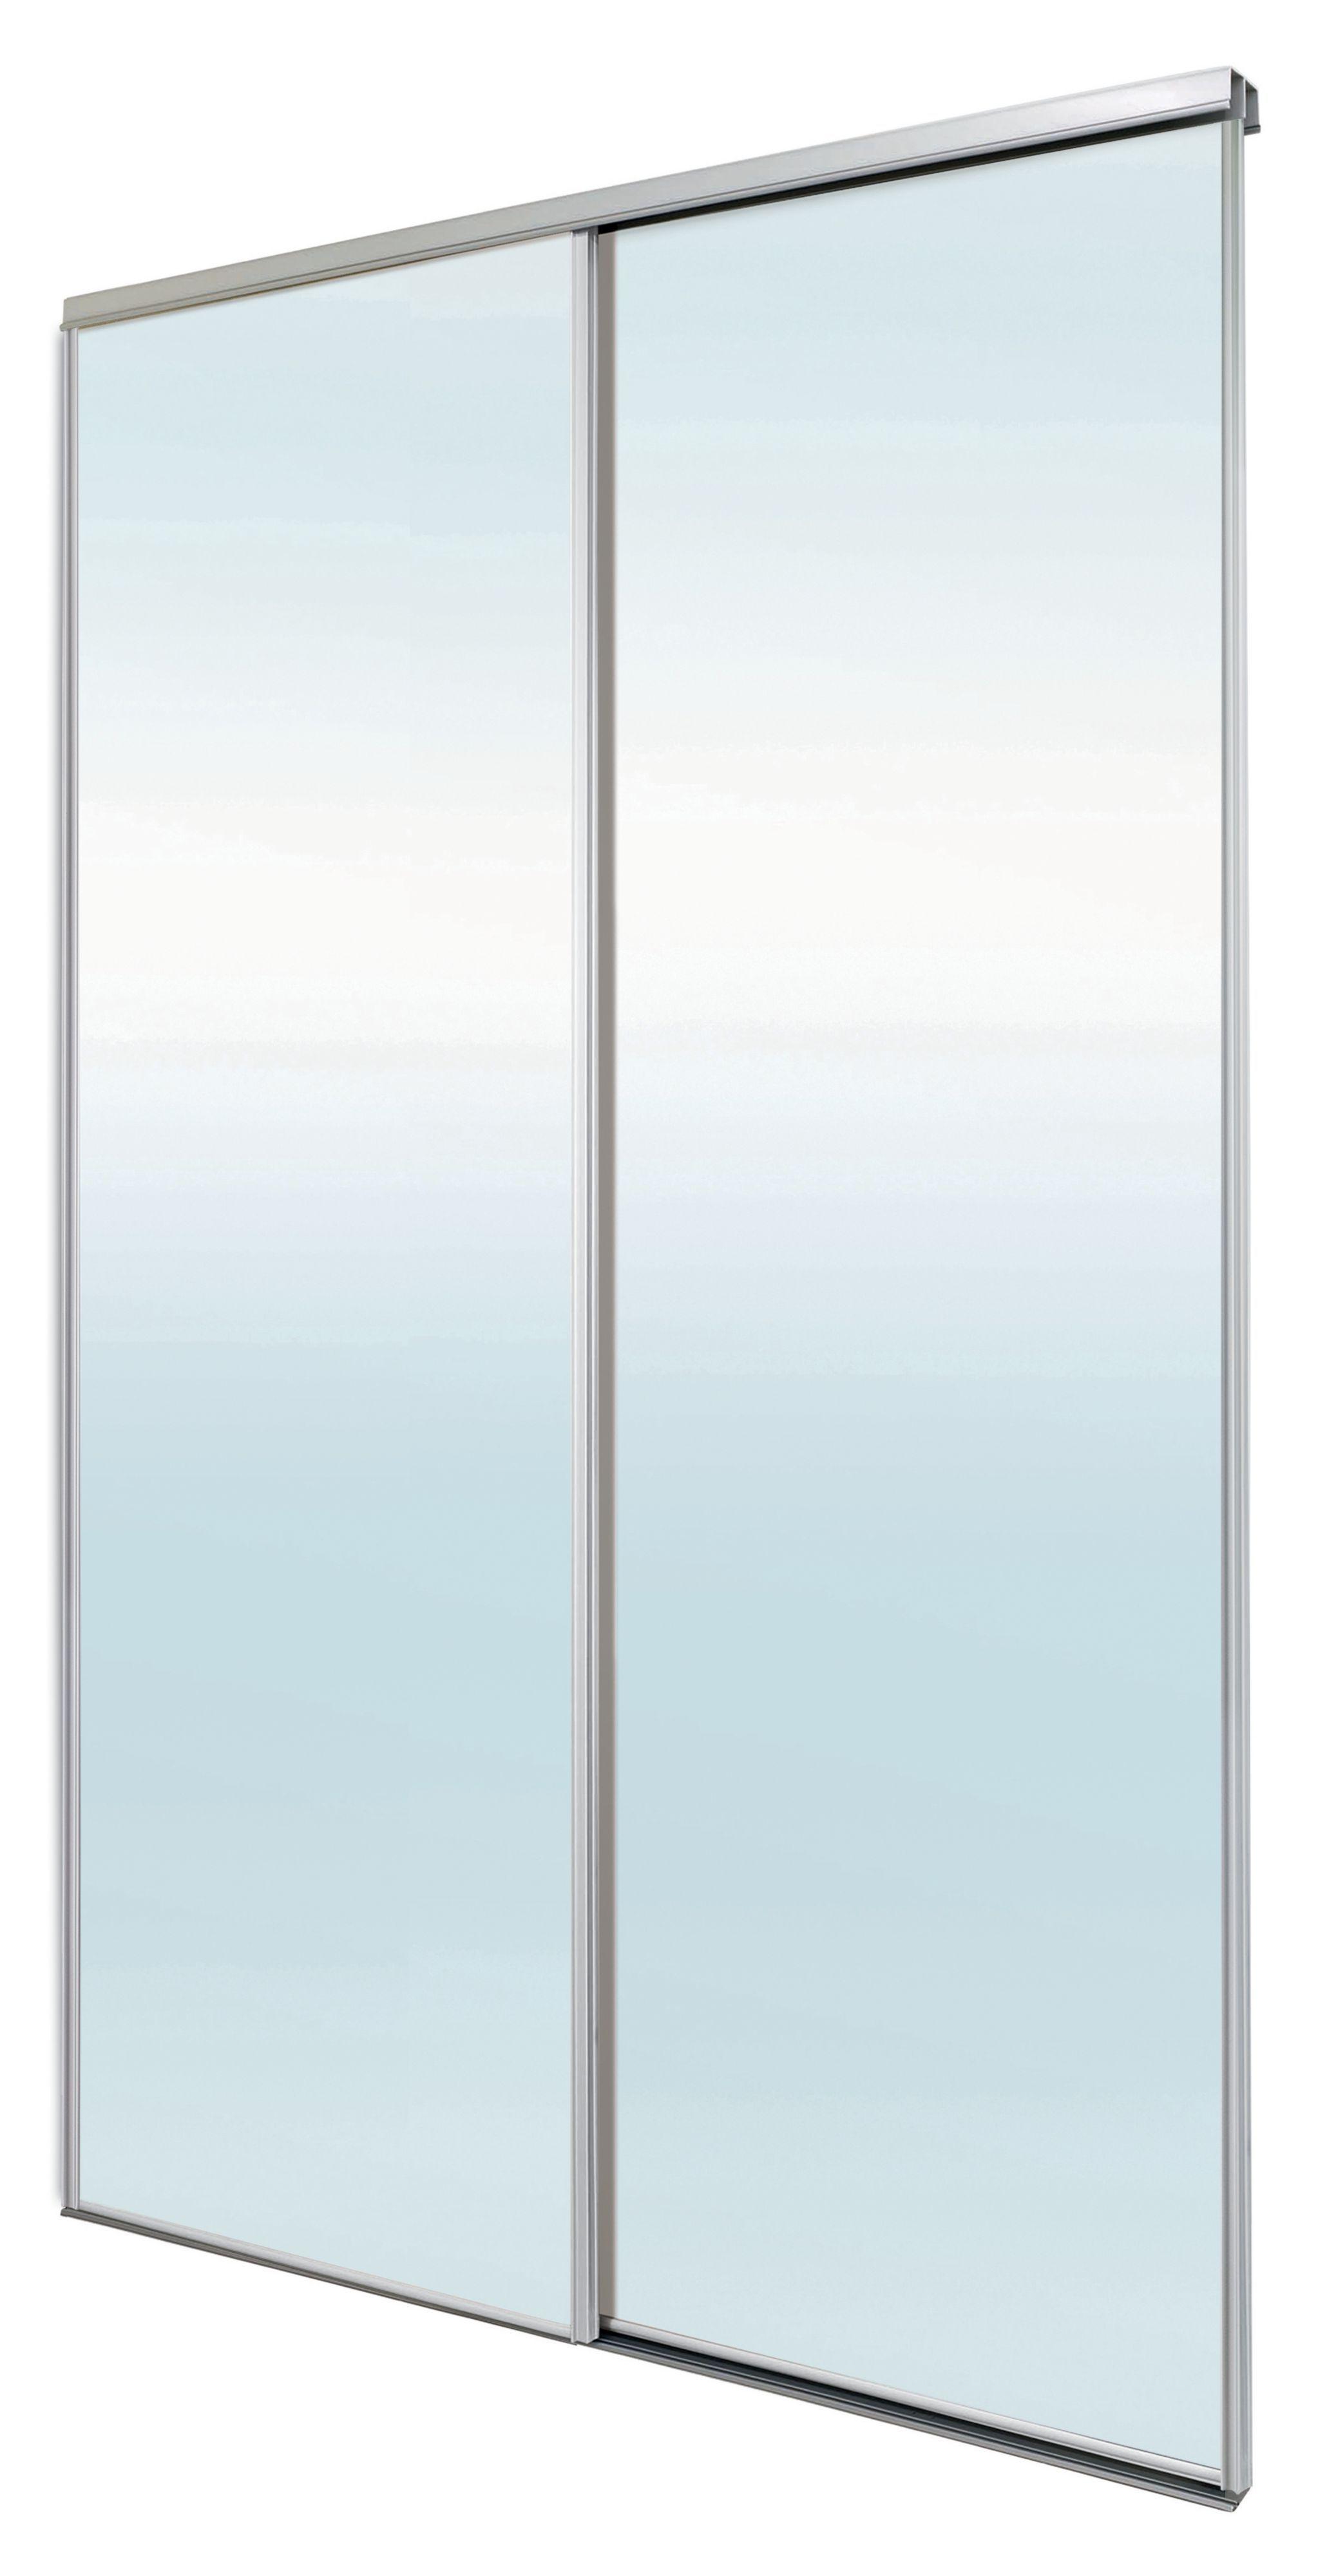 Blizz Mirrored Sliding Wardrobe Door Kit H2260 Mm W1500mm Pack